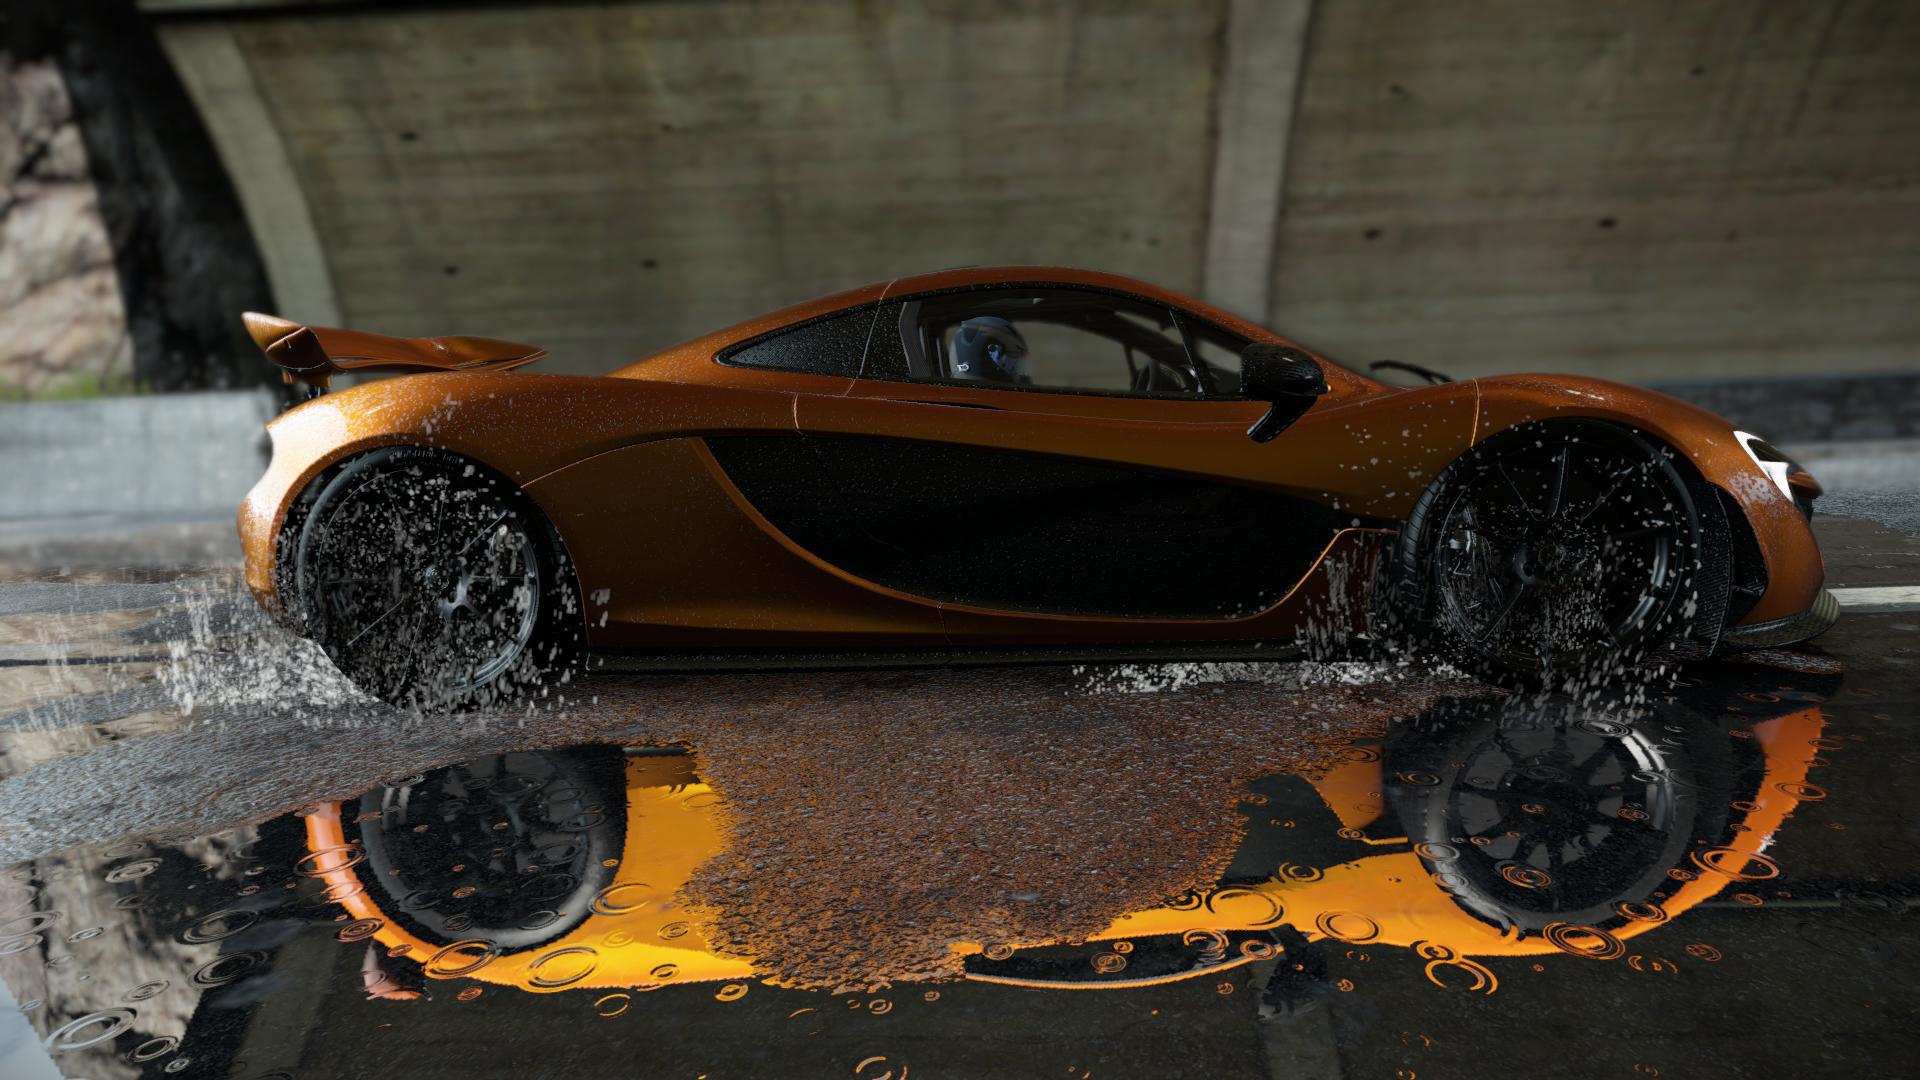 New Project Cars Screenshots Race Into View Nintendo Life